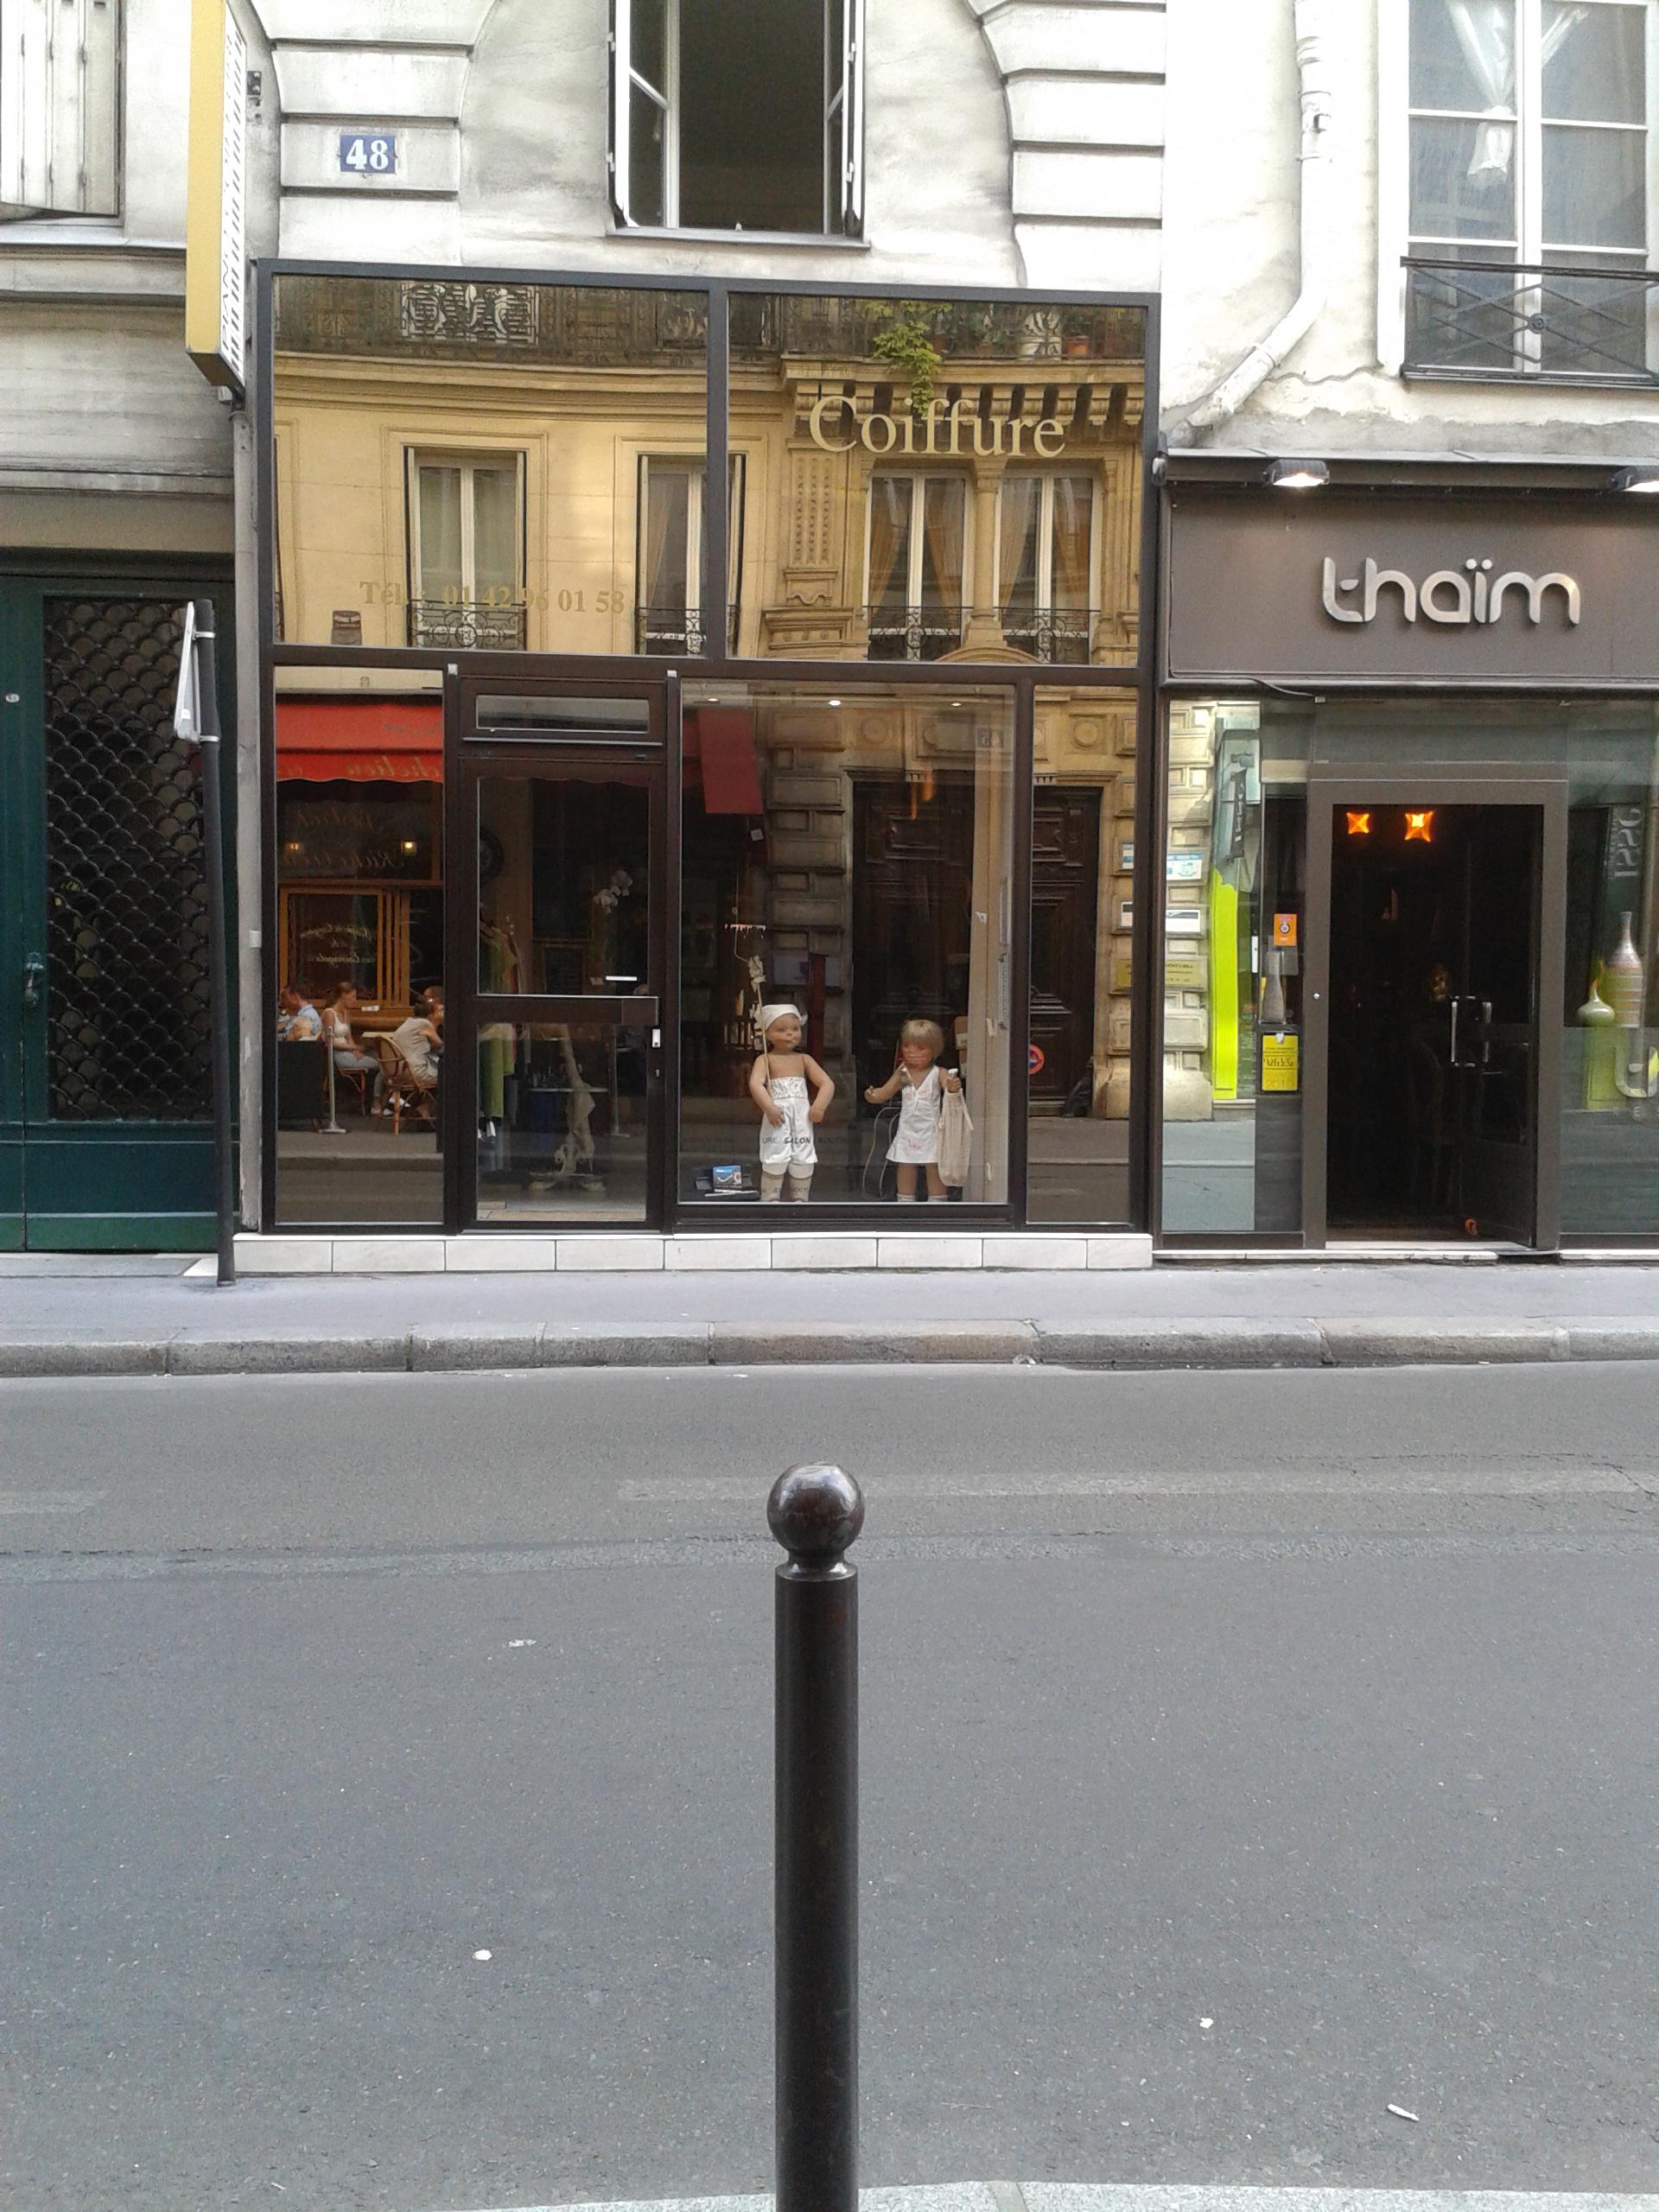 Piano Coiffure à Paris 01